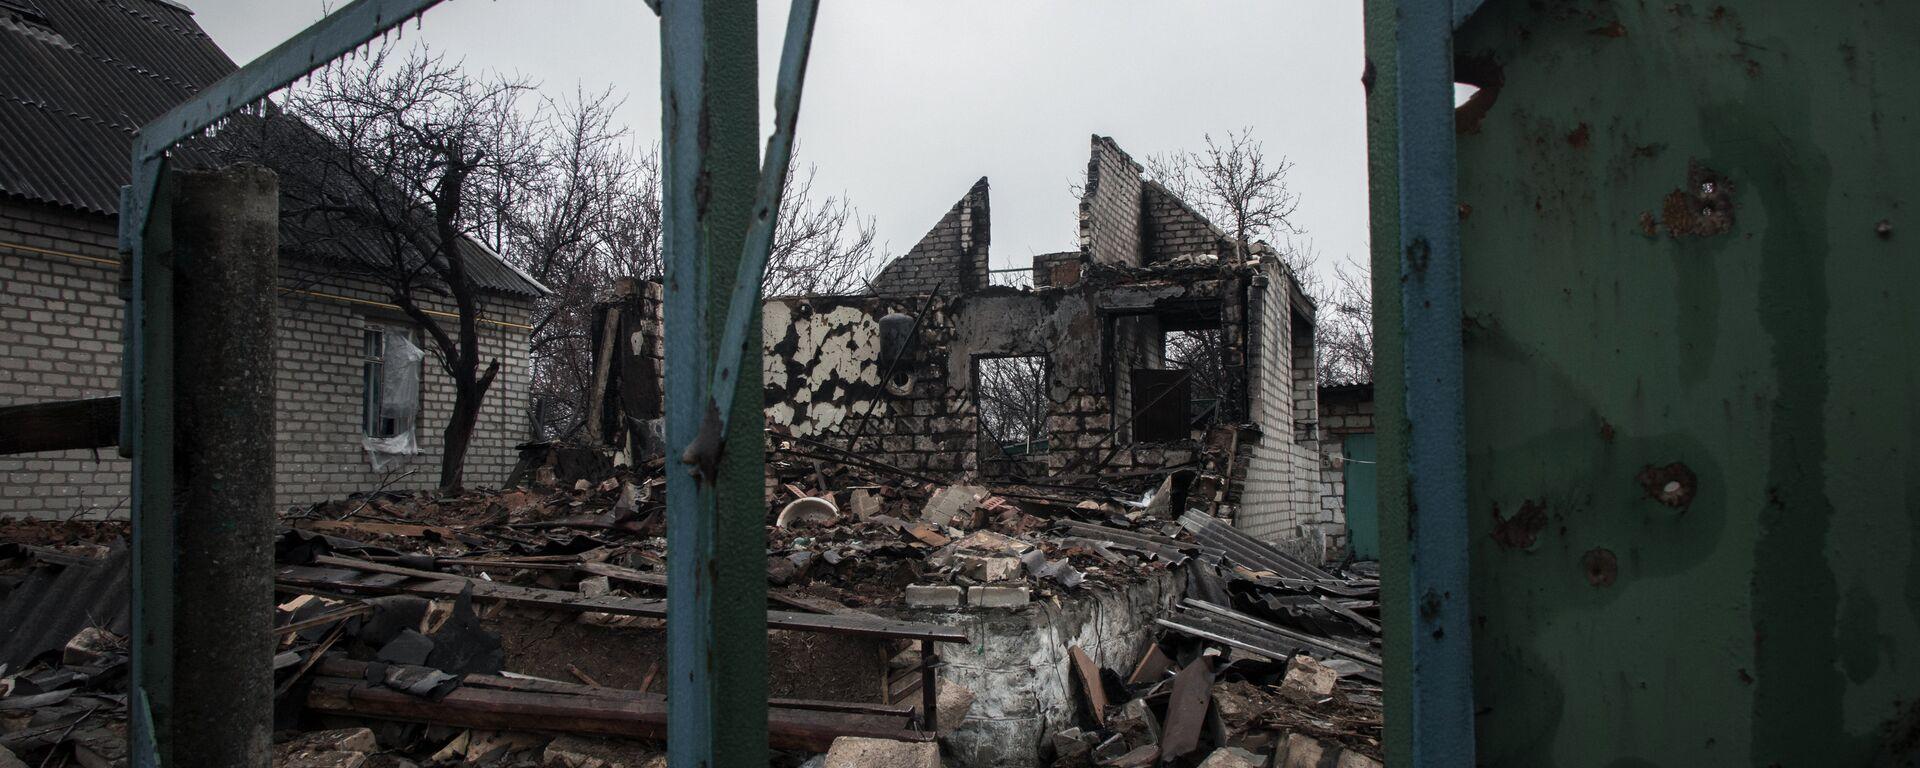 Wojna w Donbasie - Sputnik Polska, 1920, 17.03.2021